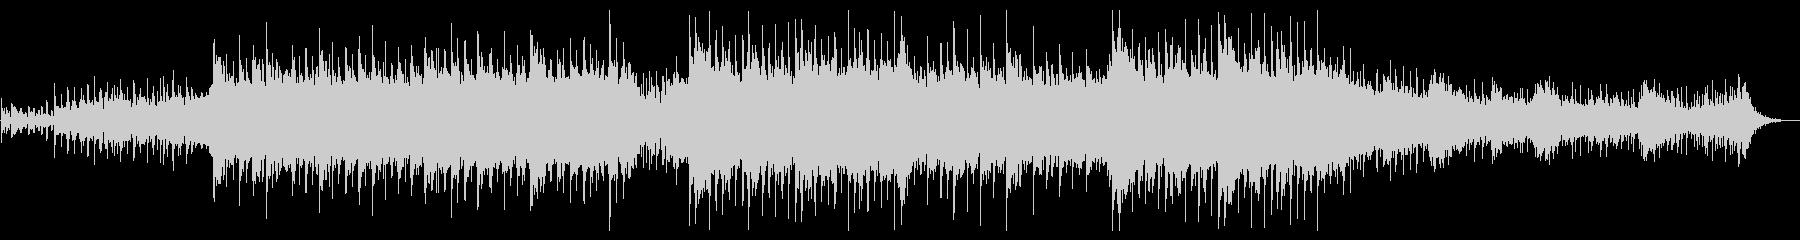 bgm37の未再生の波形